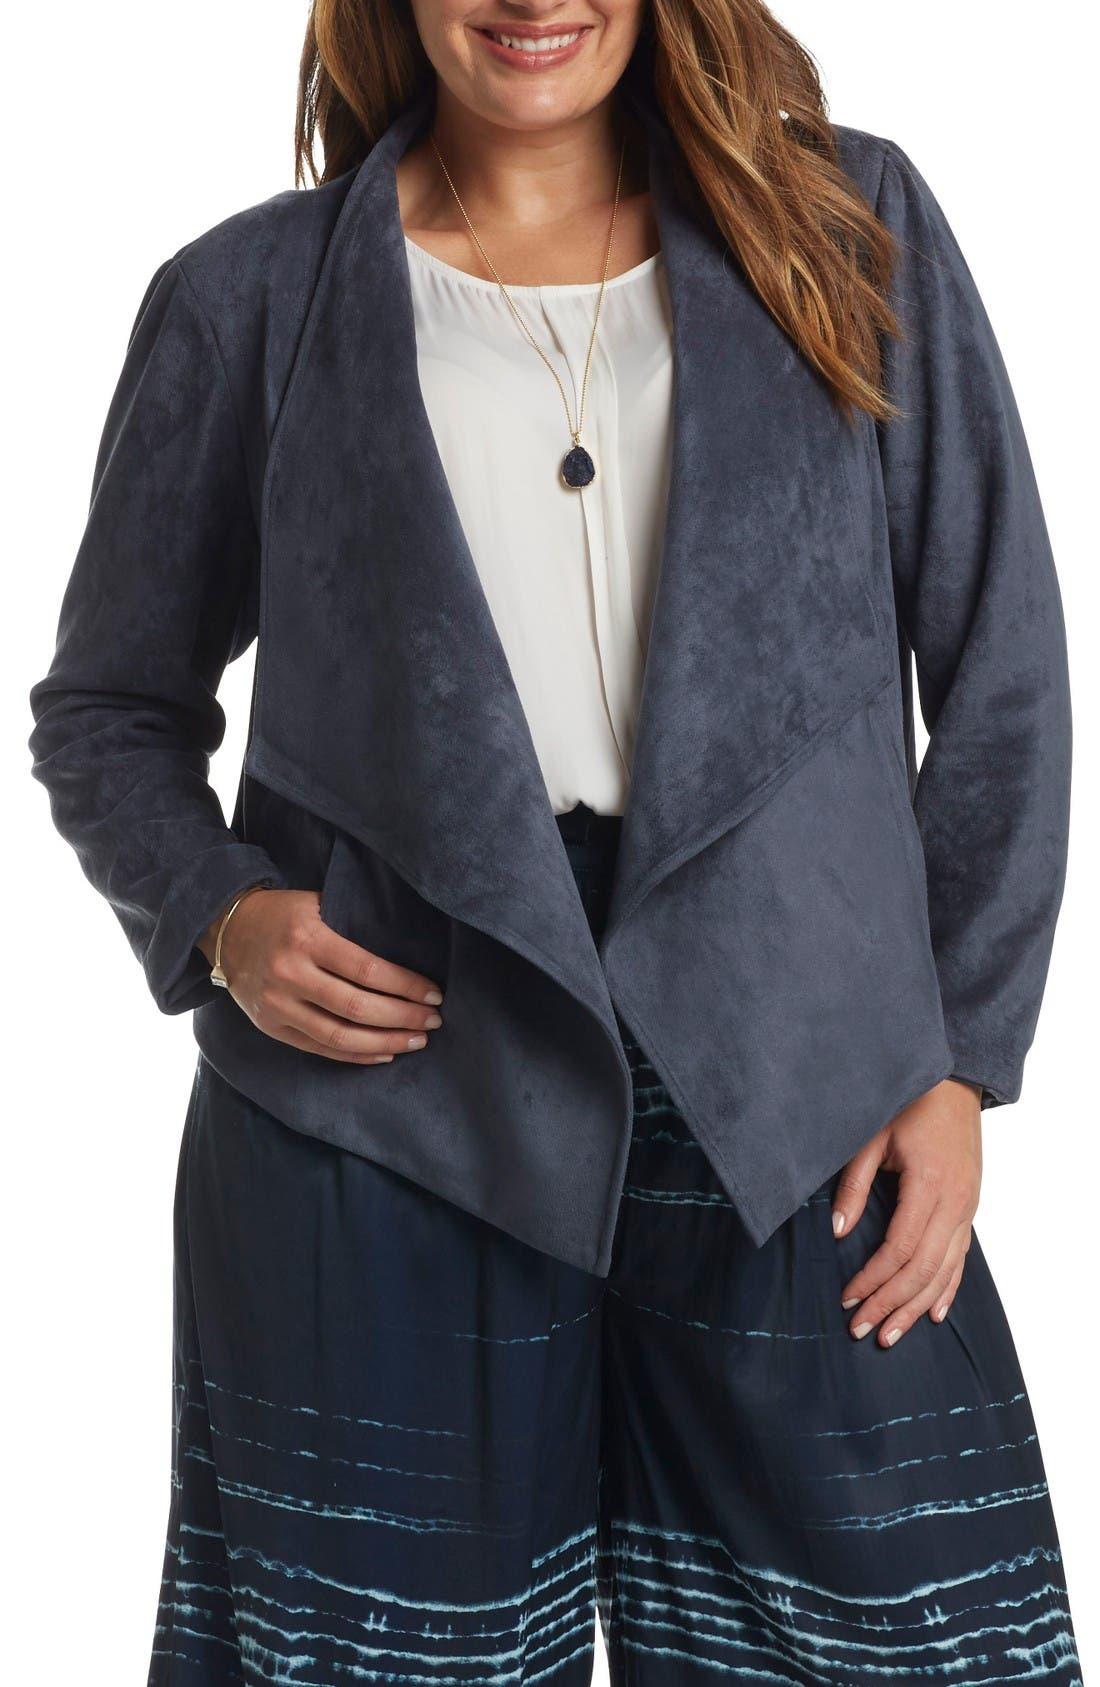 TART Sybil Faux Suede Drape Front Jacket